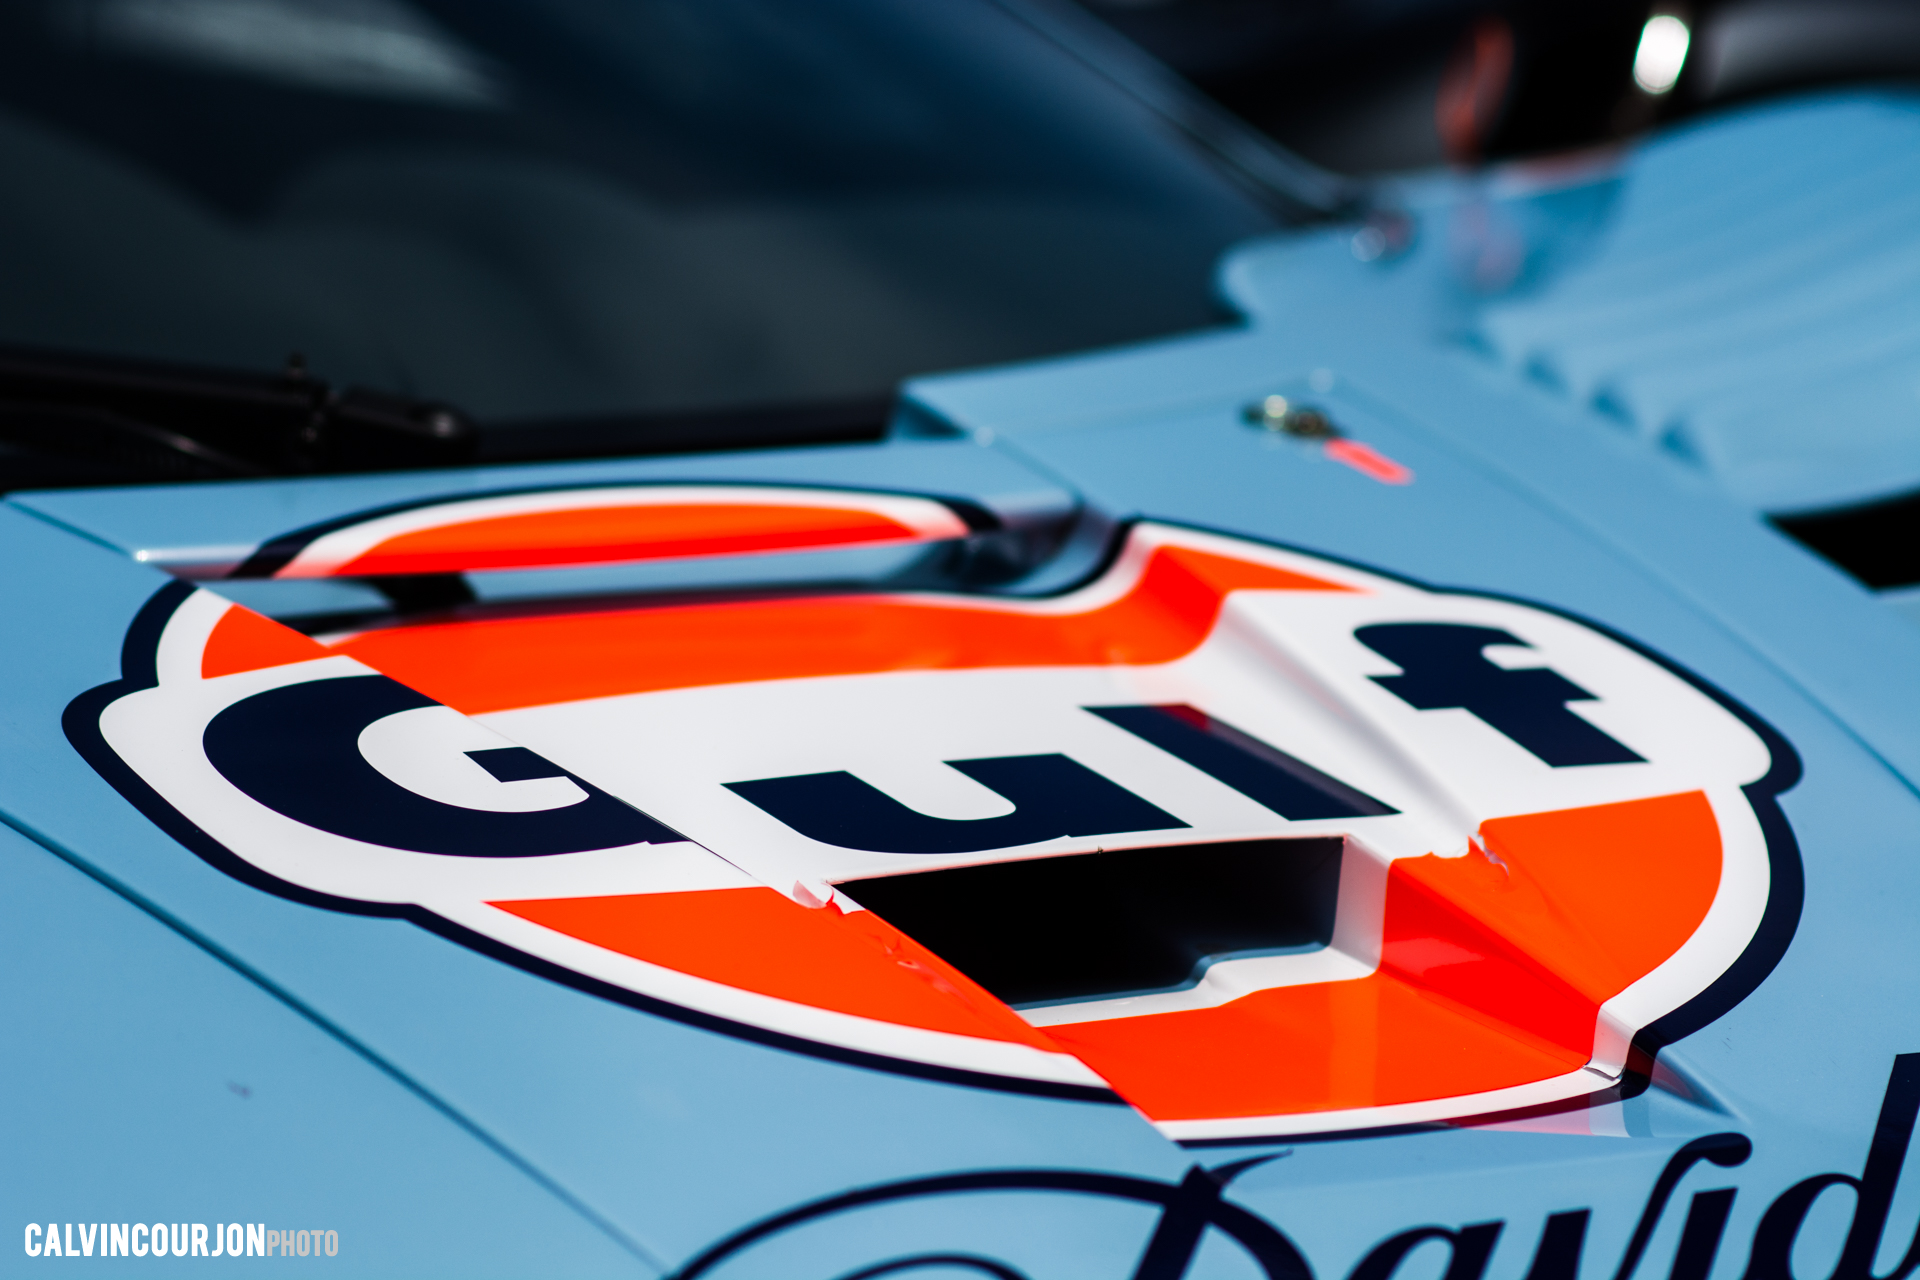 McLaren F1 GTR (1995) - capot avant - Gulf livery - McLaren95 - Le Mans - 2015 - photo Calvin Courjon